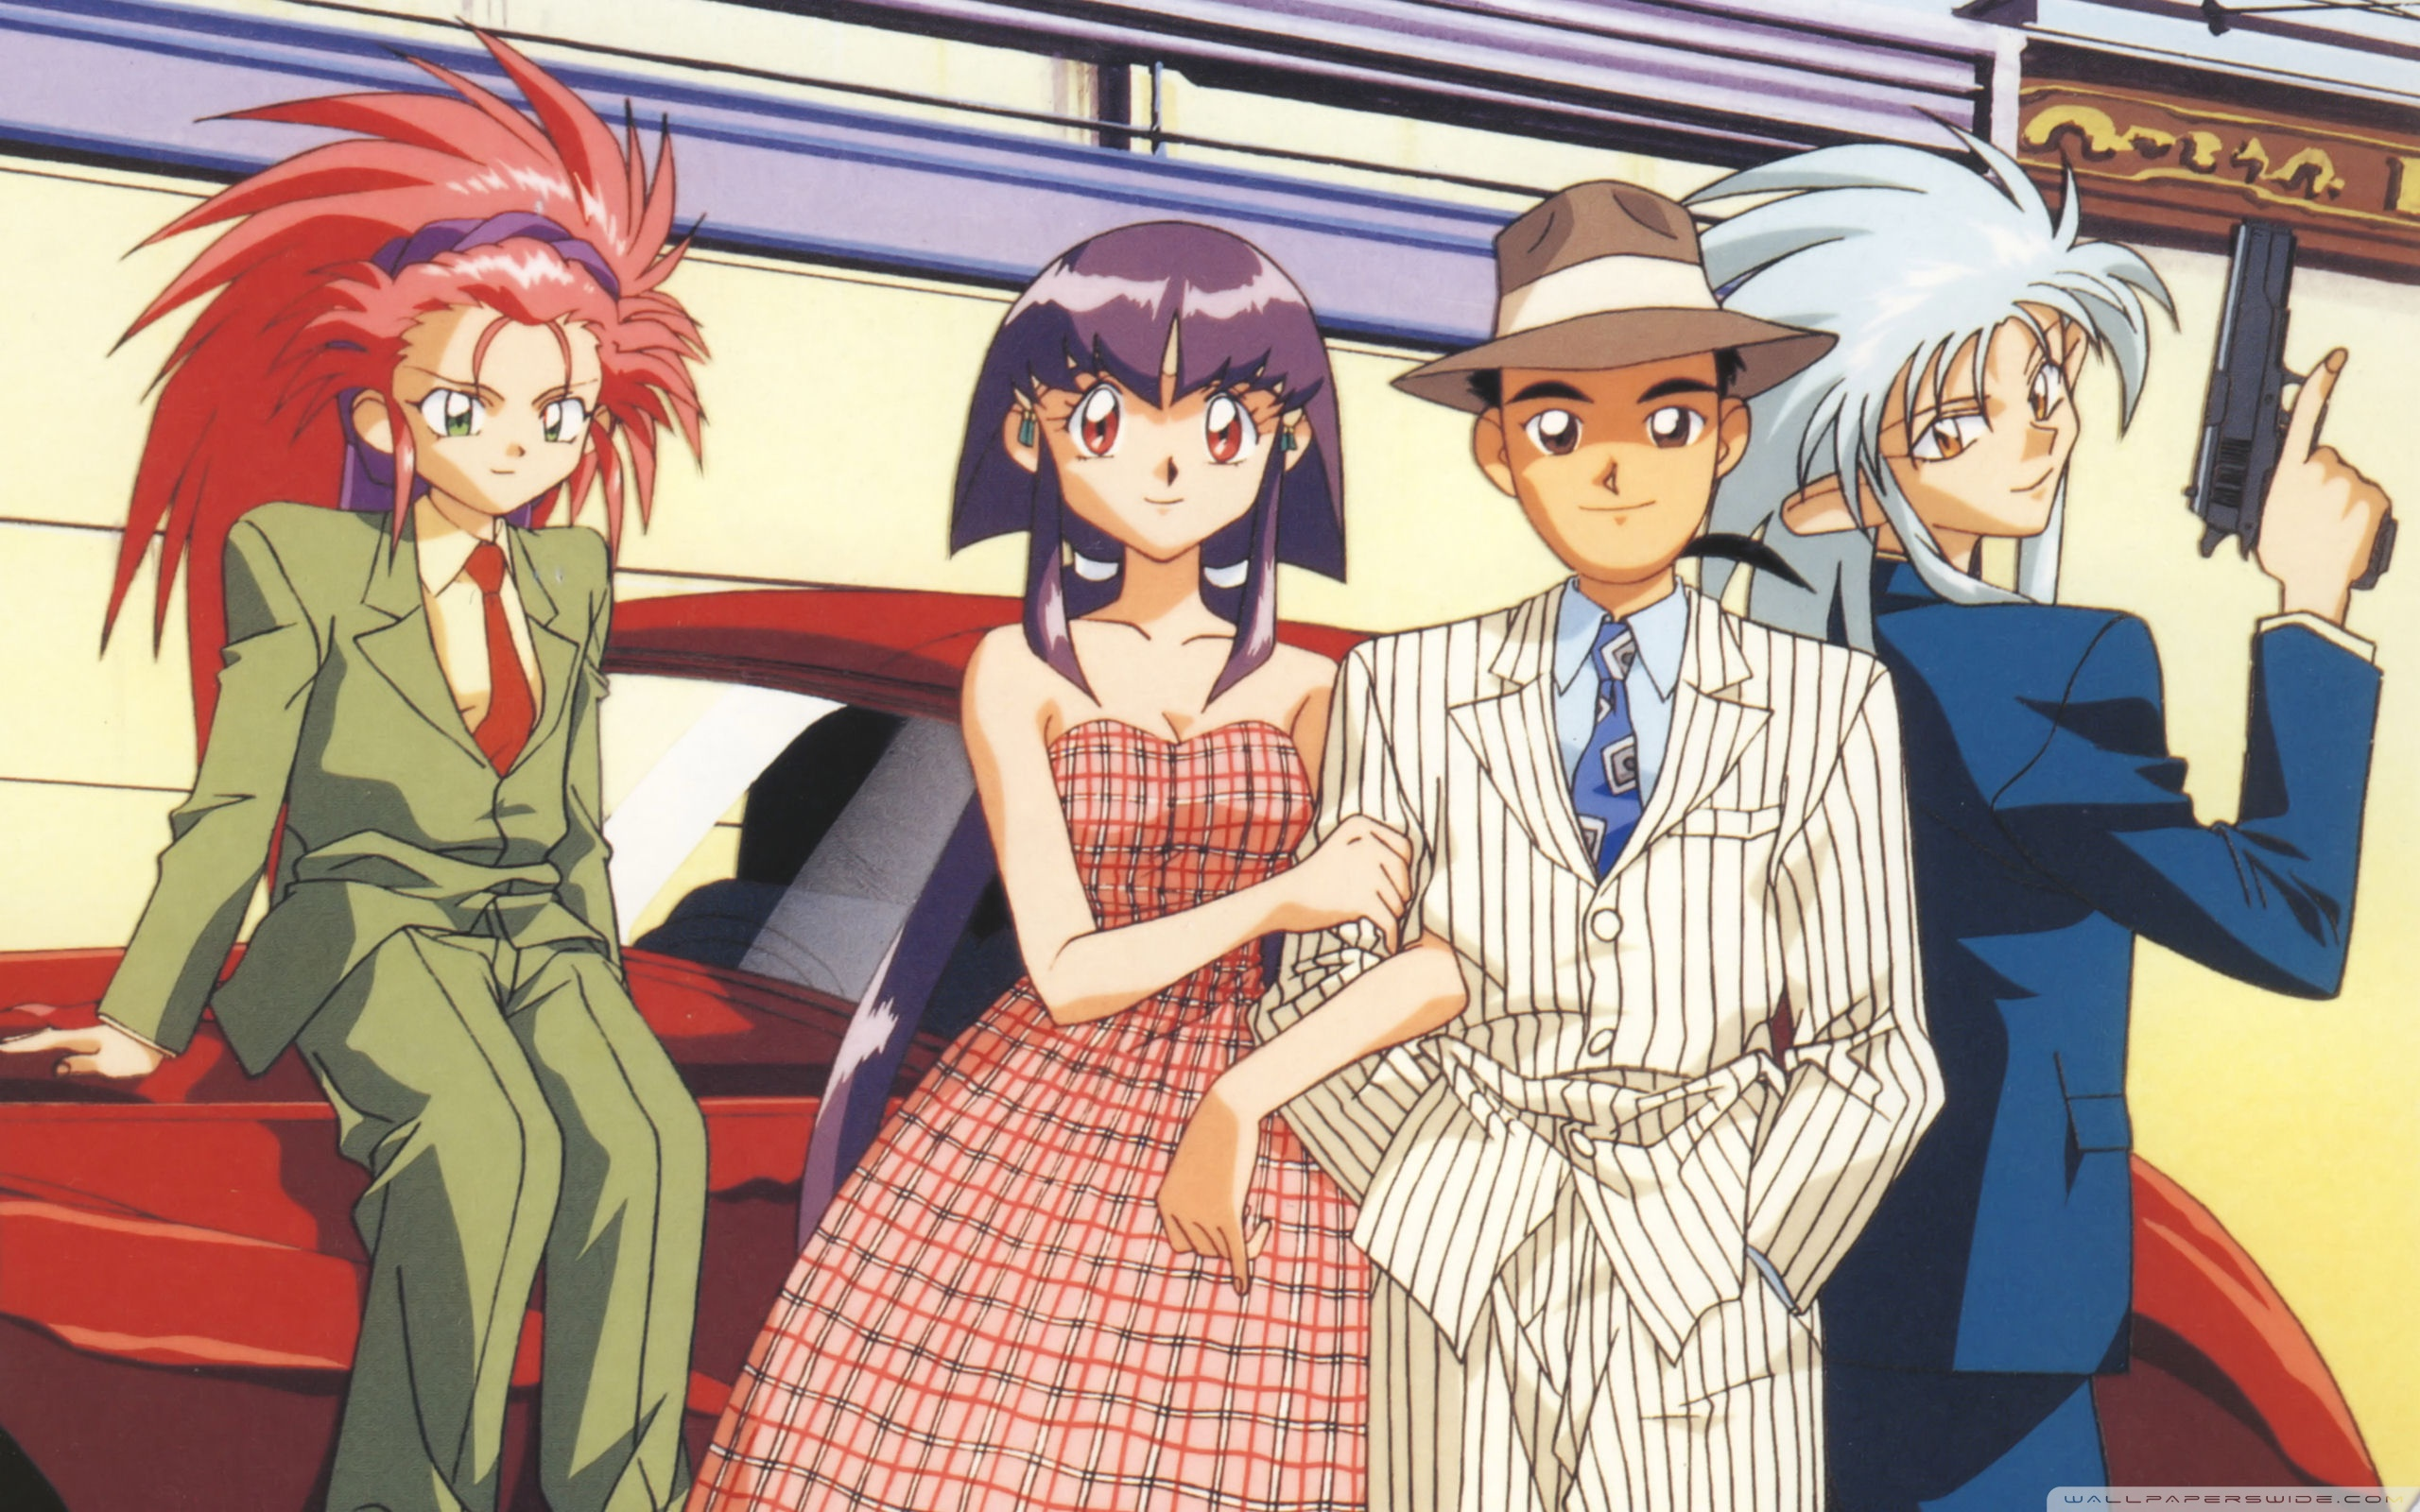 Tenchi Muyo Wallpapers Anime Hq Tenchi Muyo Pictures 4k